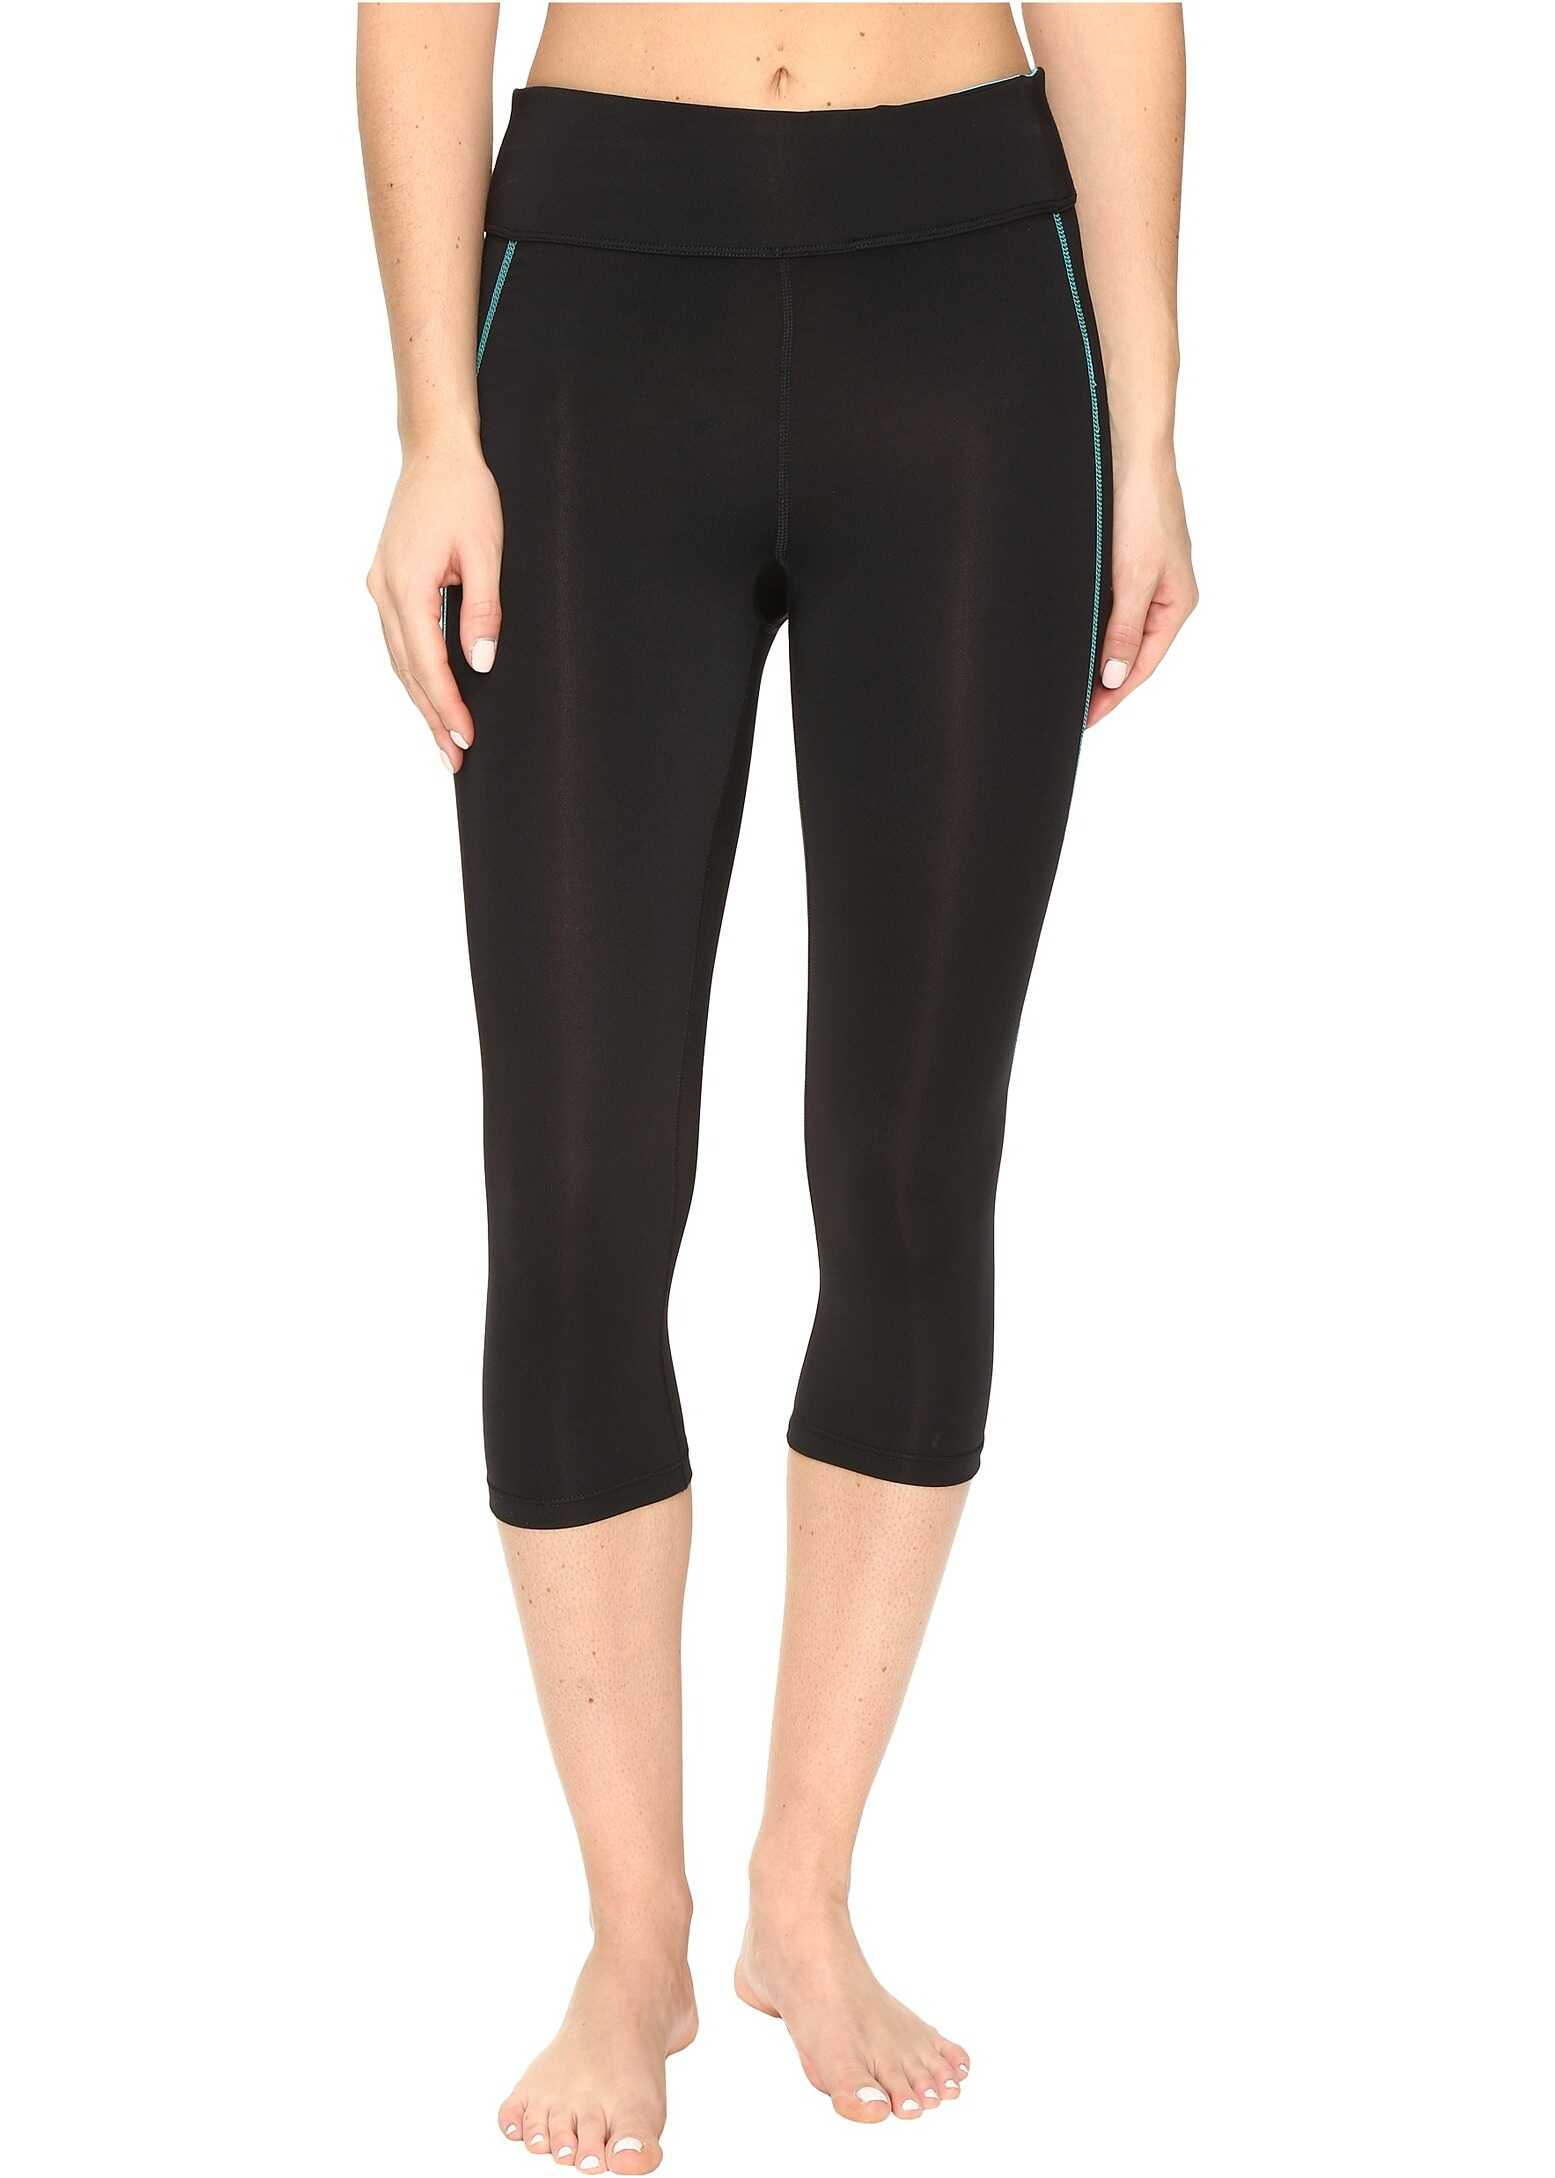 Pantaloni Femei Fila Spirit Tight Capris Black/vir